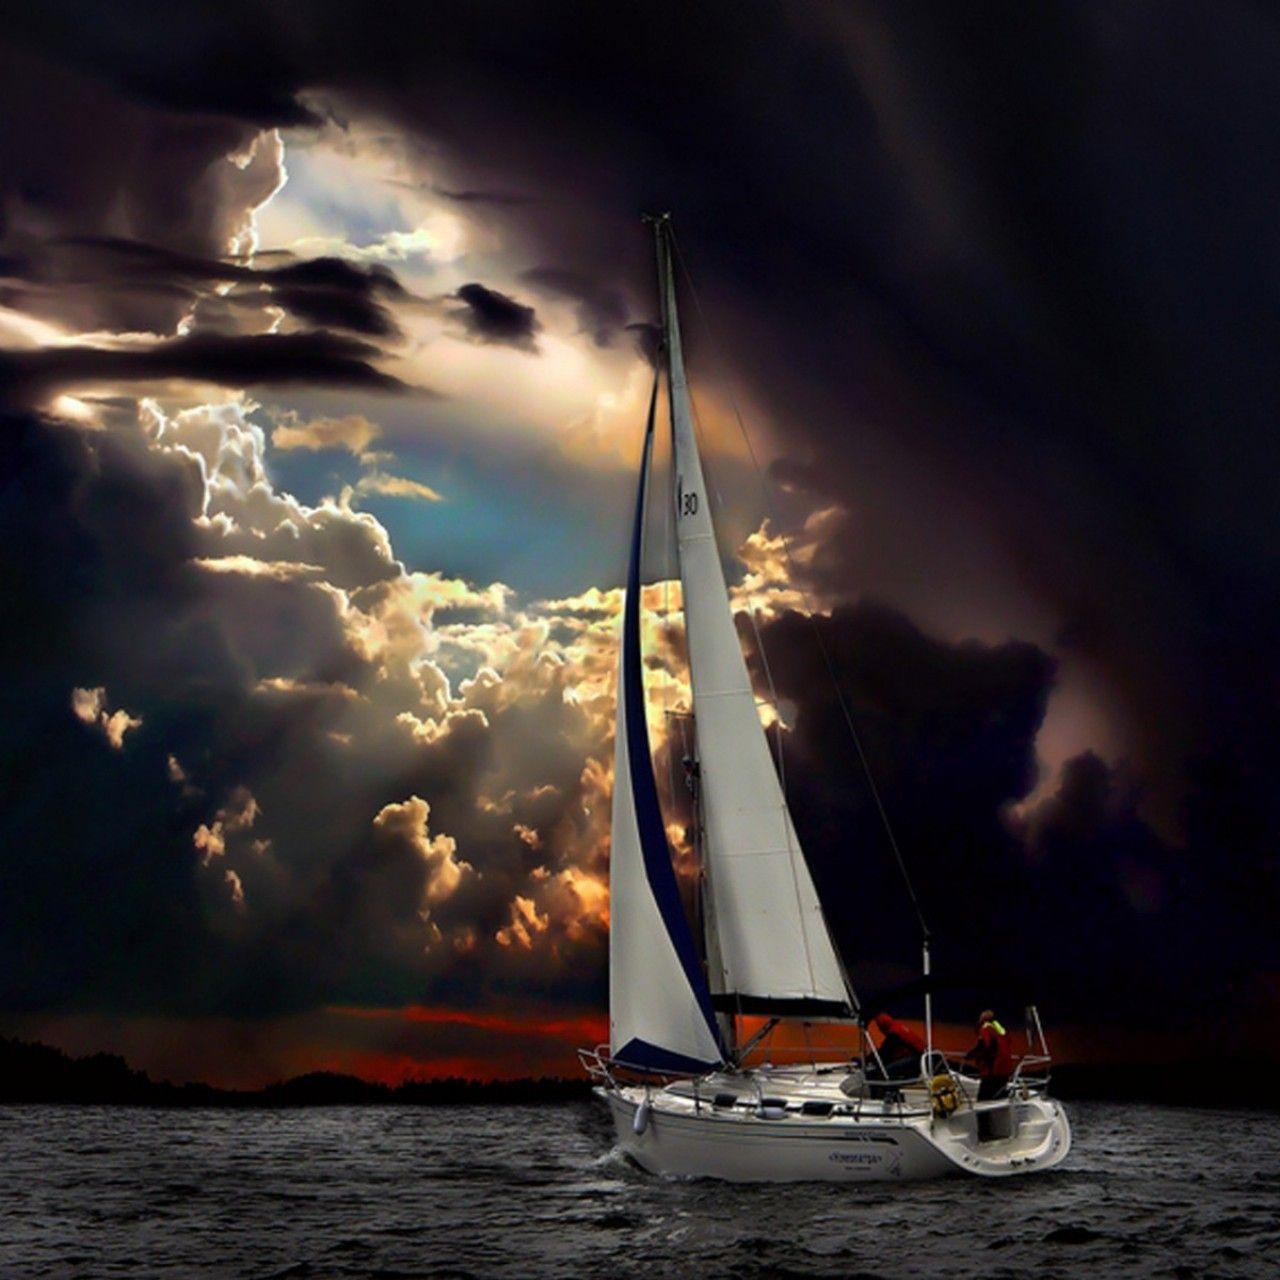 Navigation, Sea, Dark Clouds, Storm, Nature